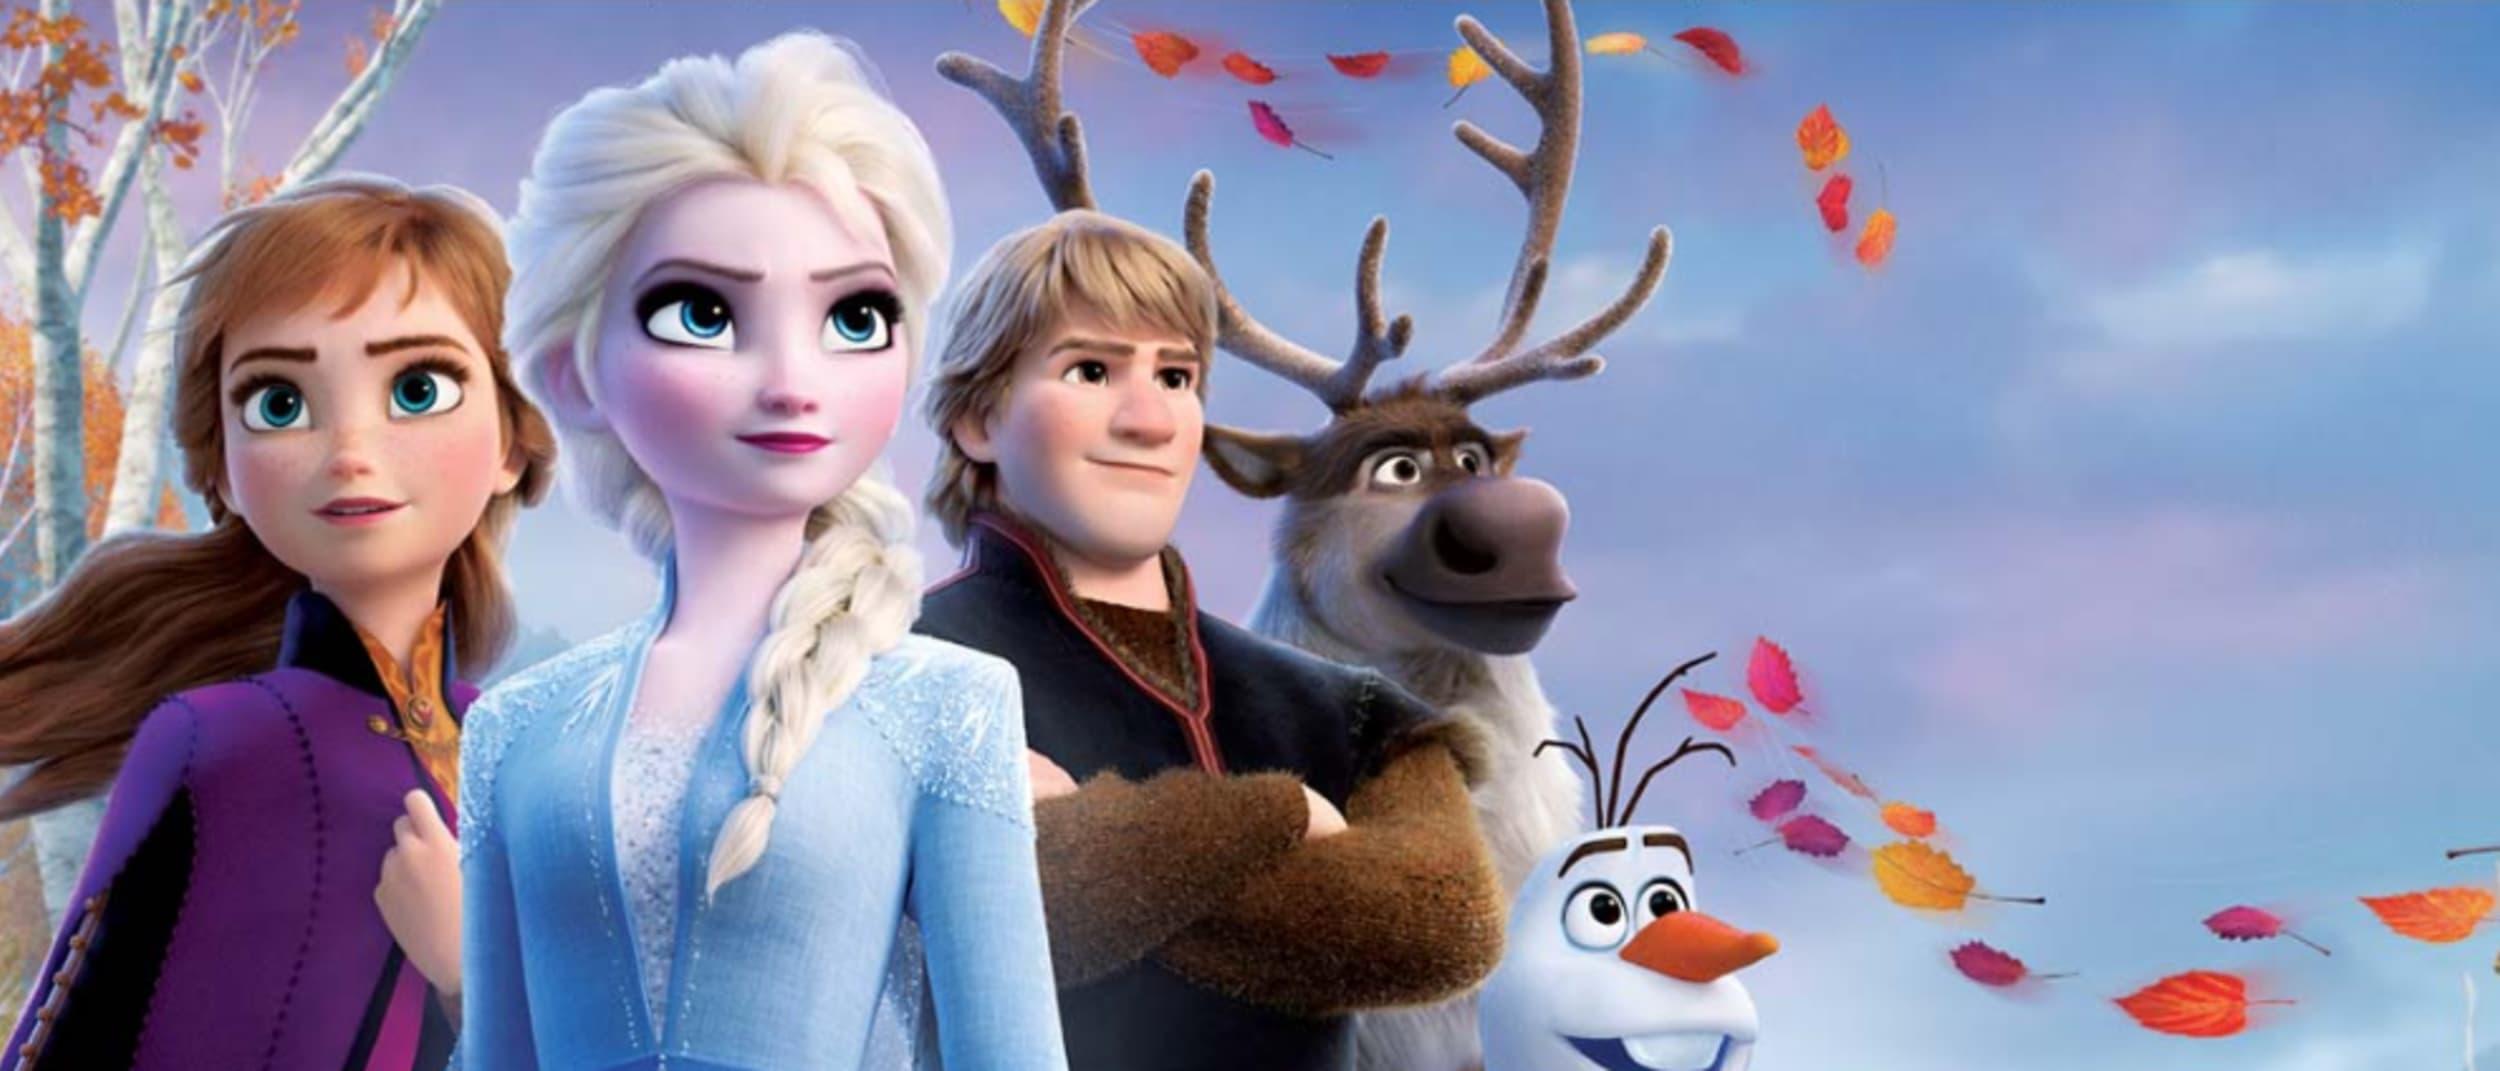 Every cool kid needs Frozen II merch to melt over!